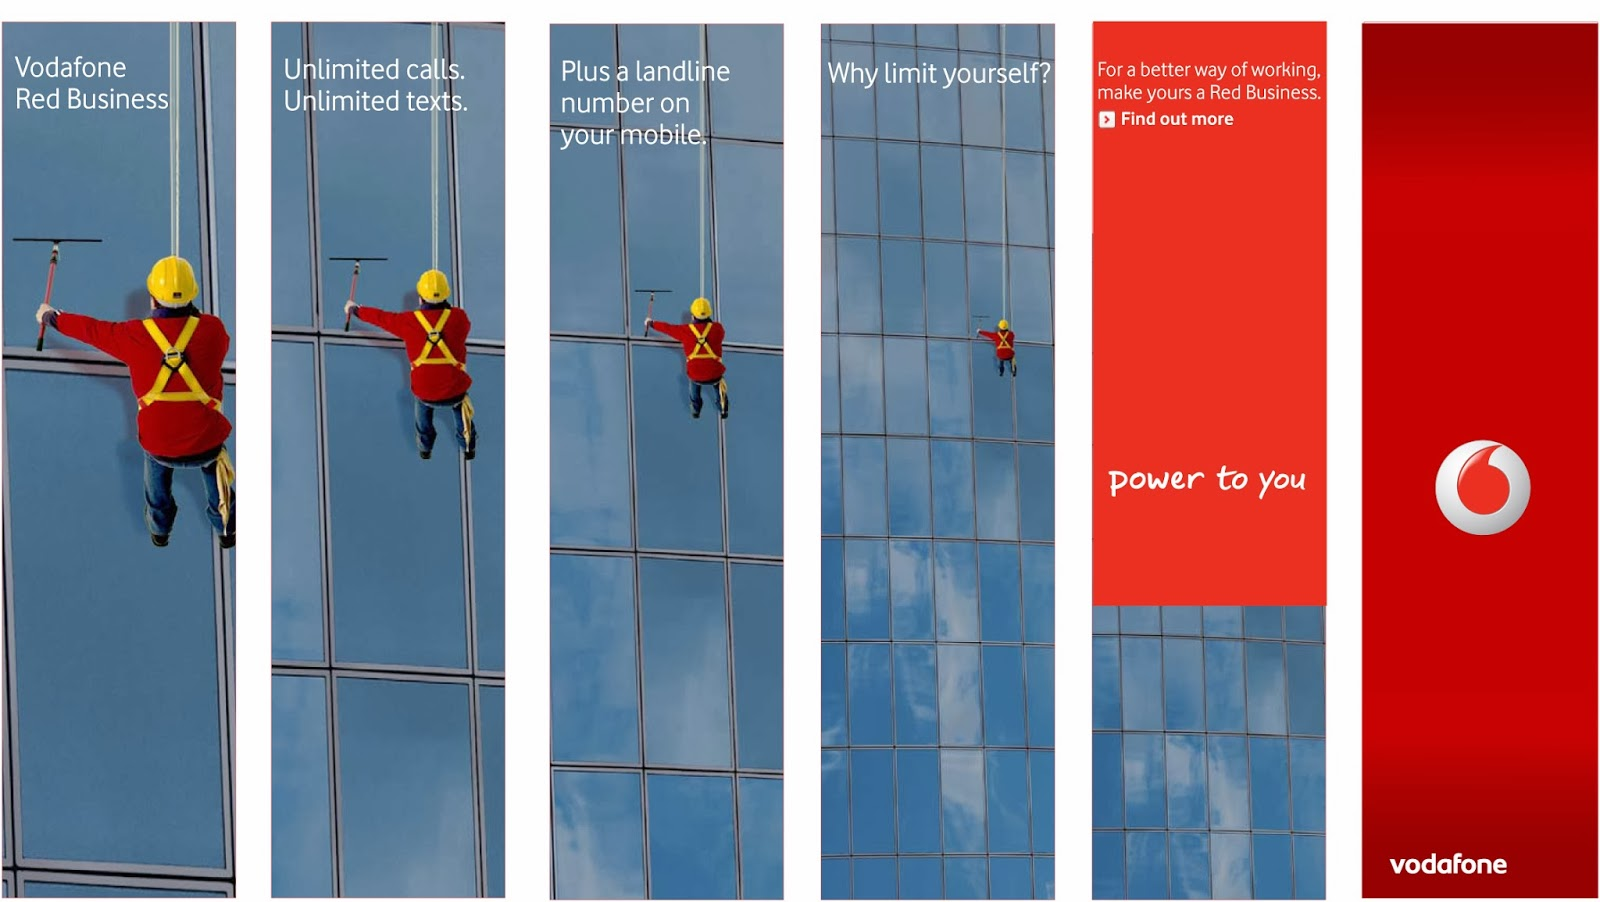 Murray Johns : Vodafone Red Business ATL